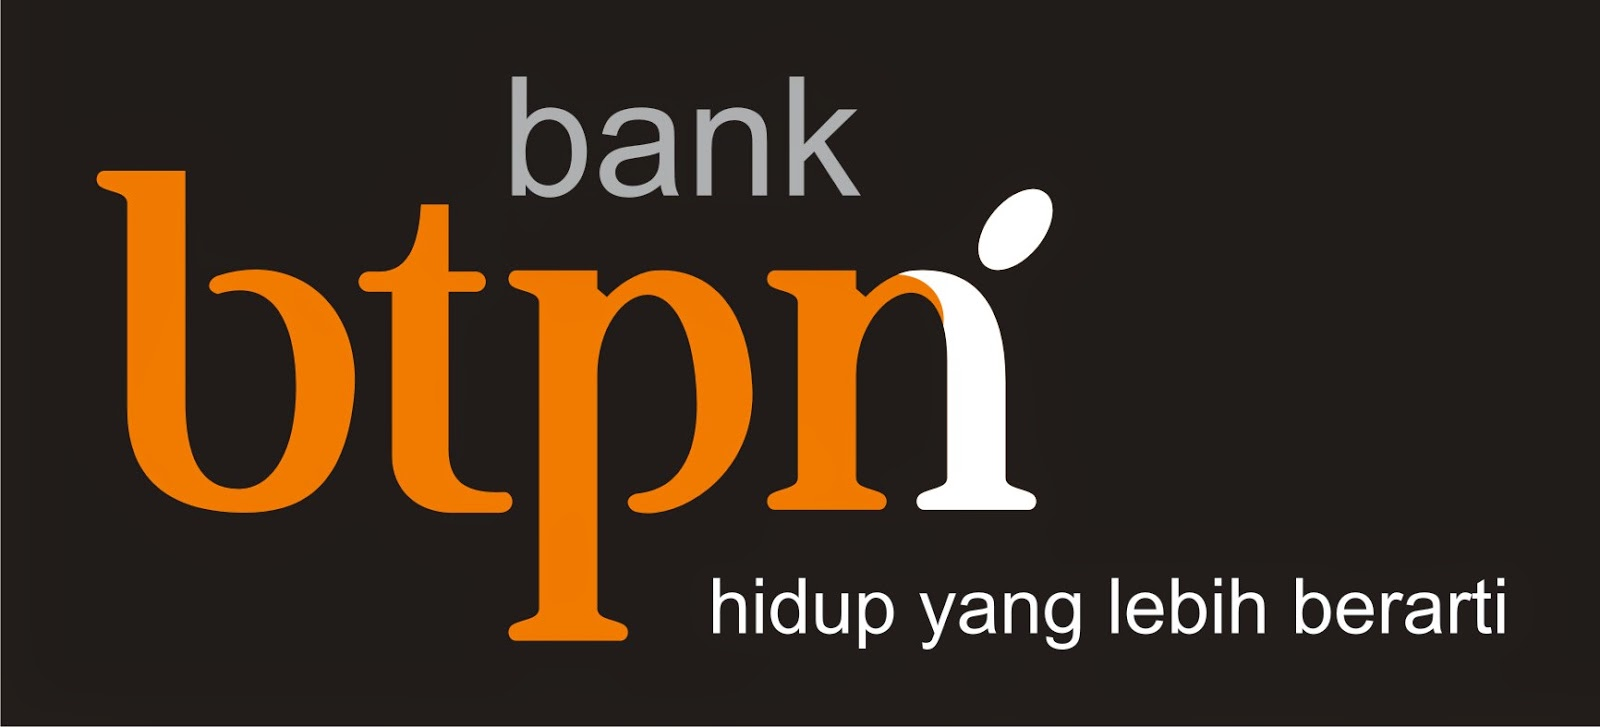 Lowongan Kerja Community Officer PT. Bank Tabungan Pensiunan Nasional (BTPN) Syariah Sumatera Selatan